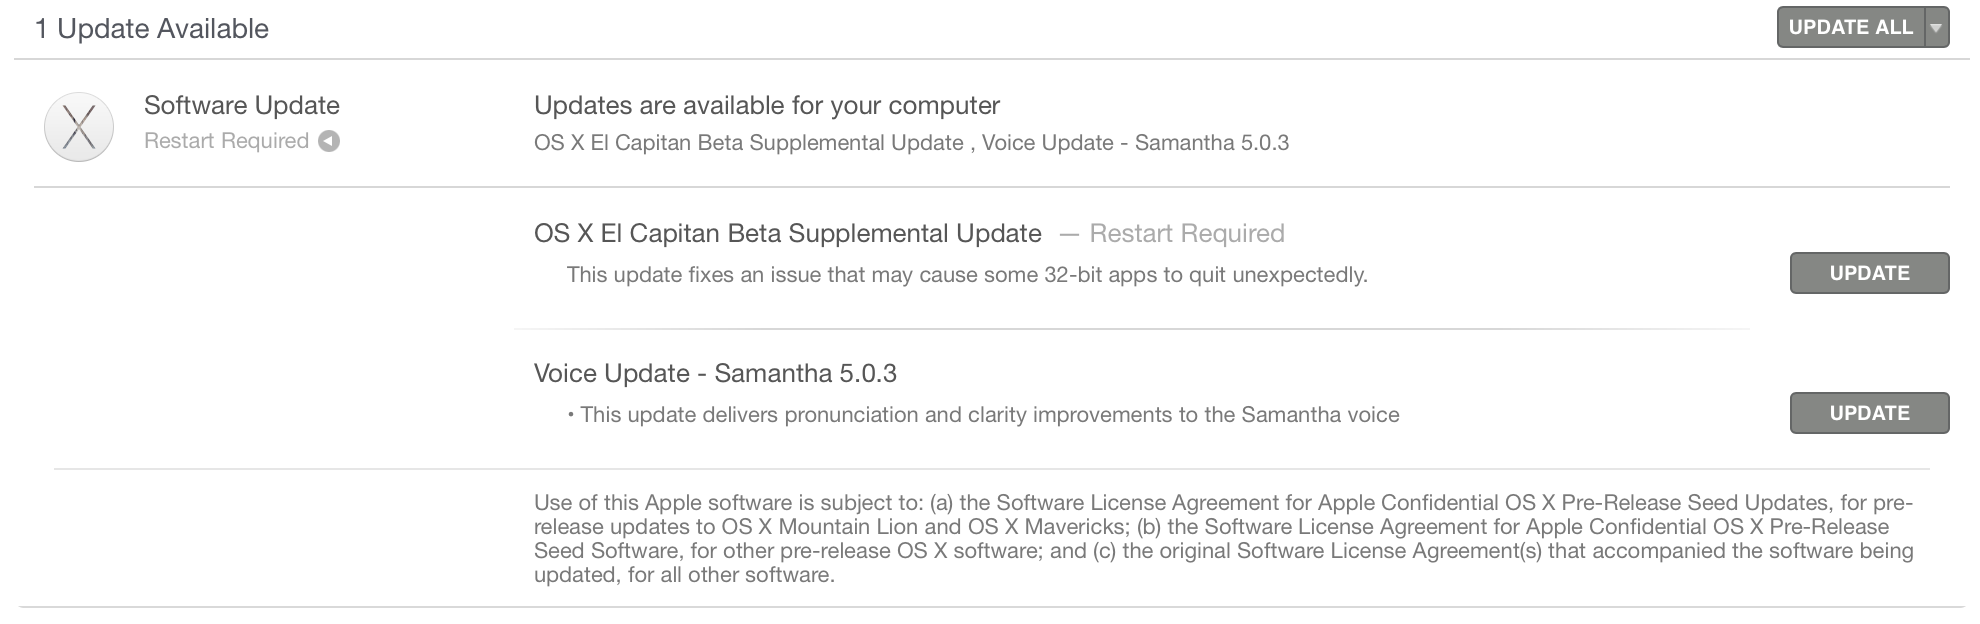 OS X El Capitan Supplemental Update